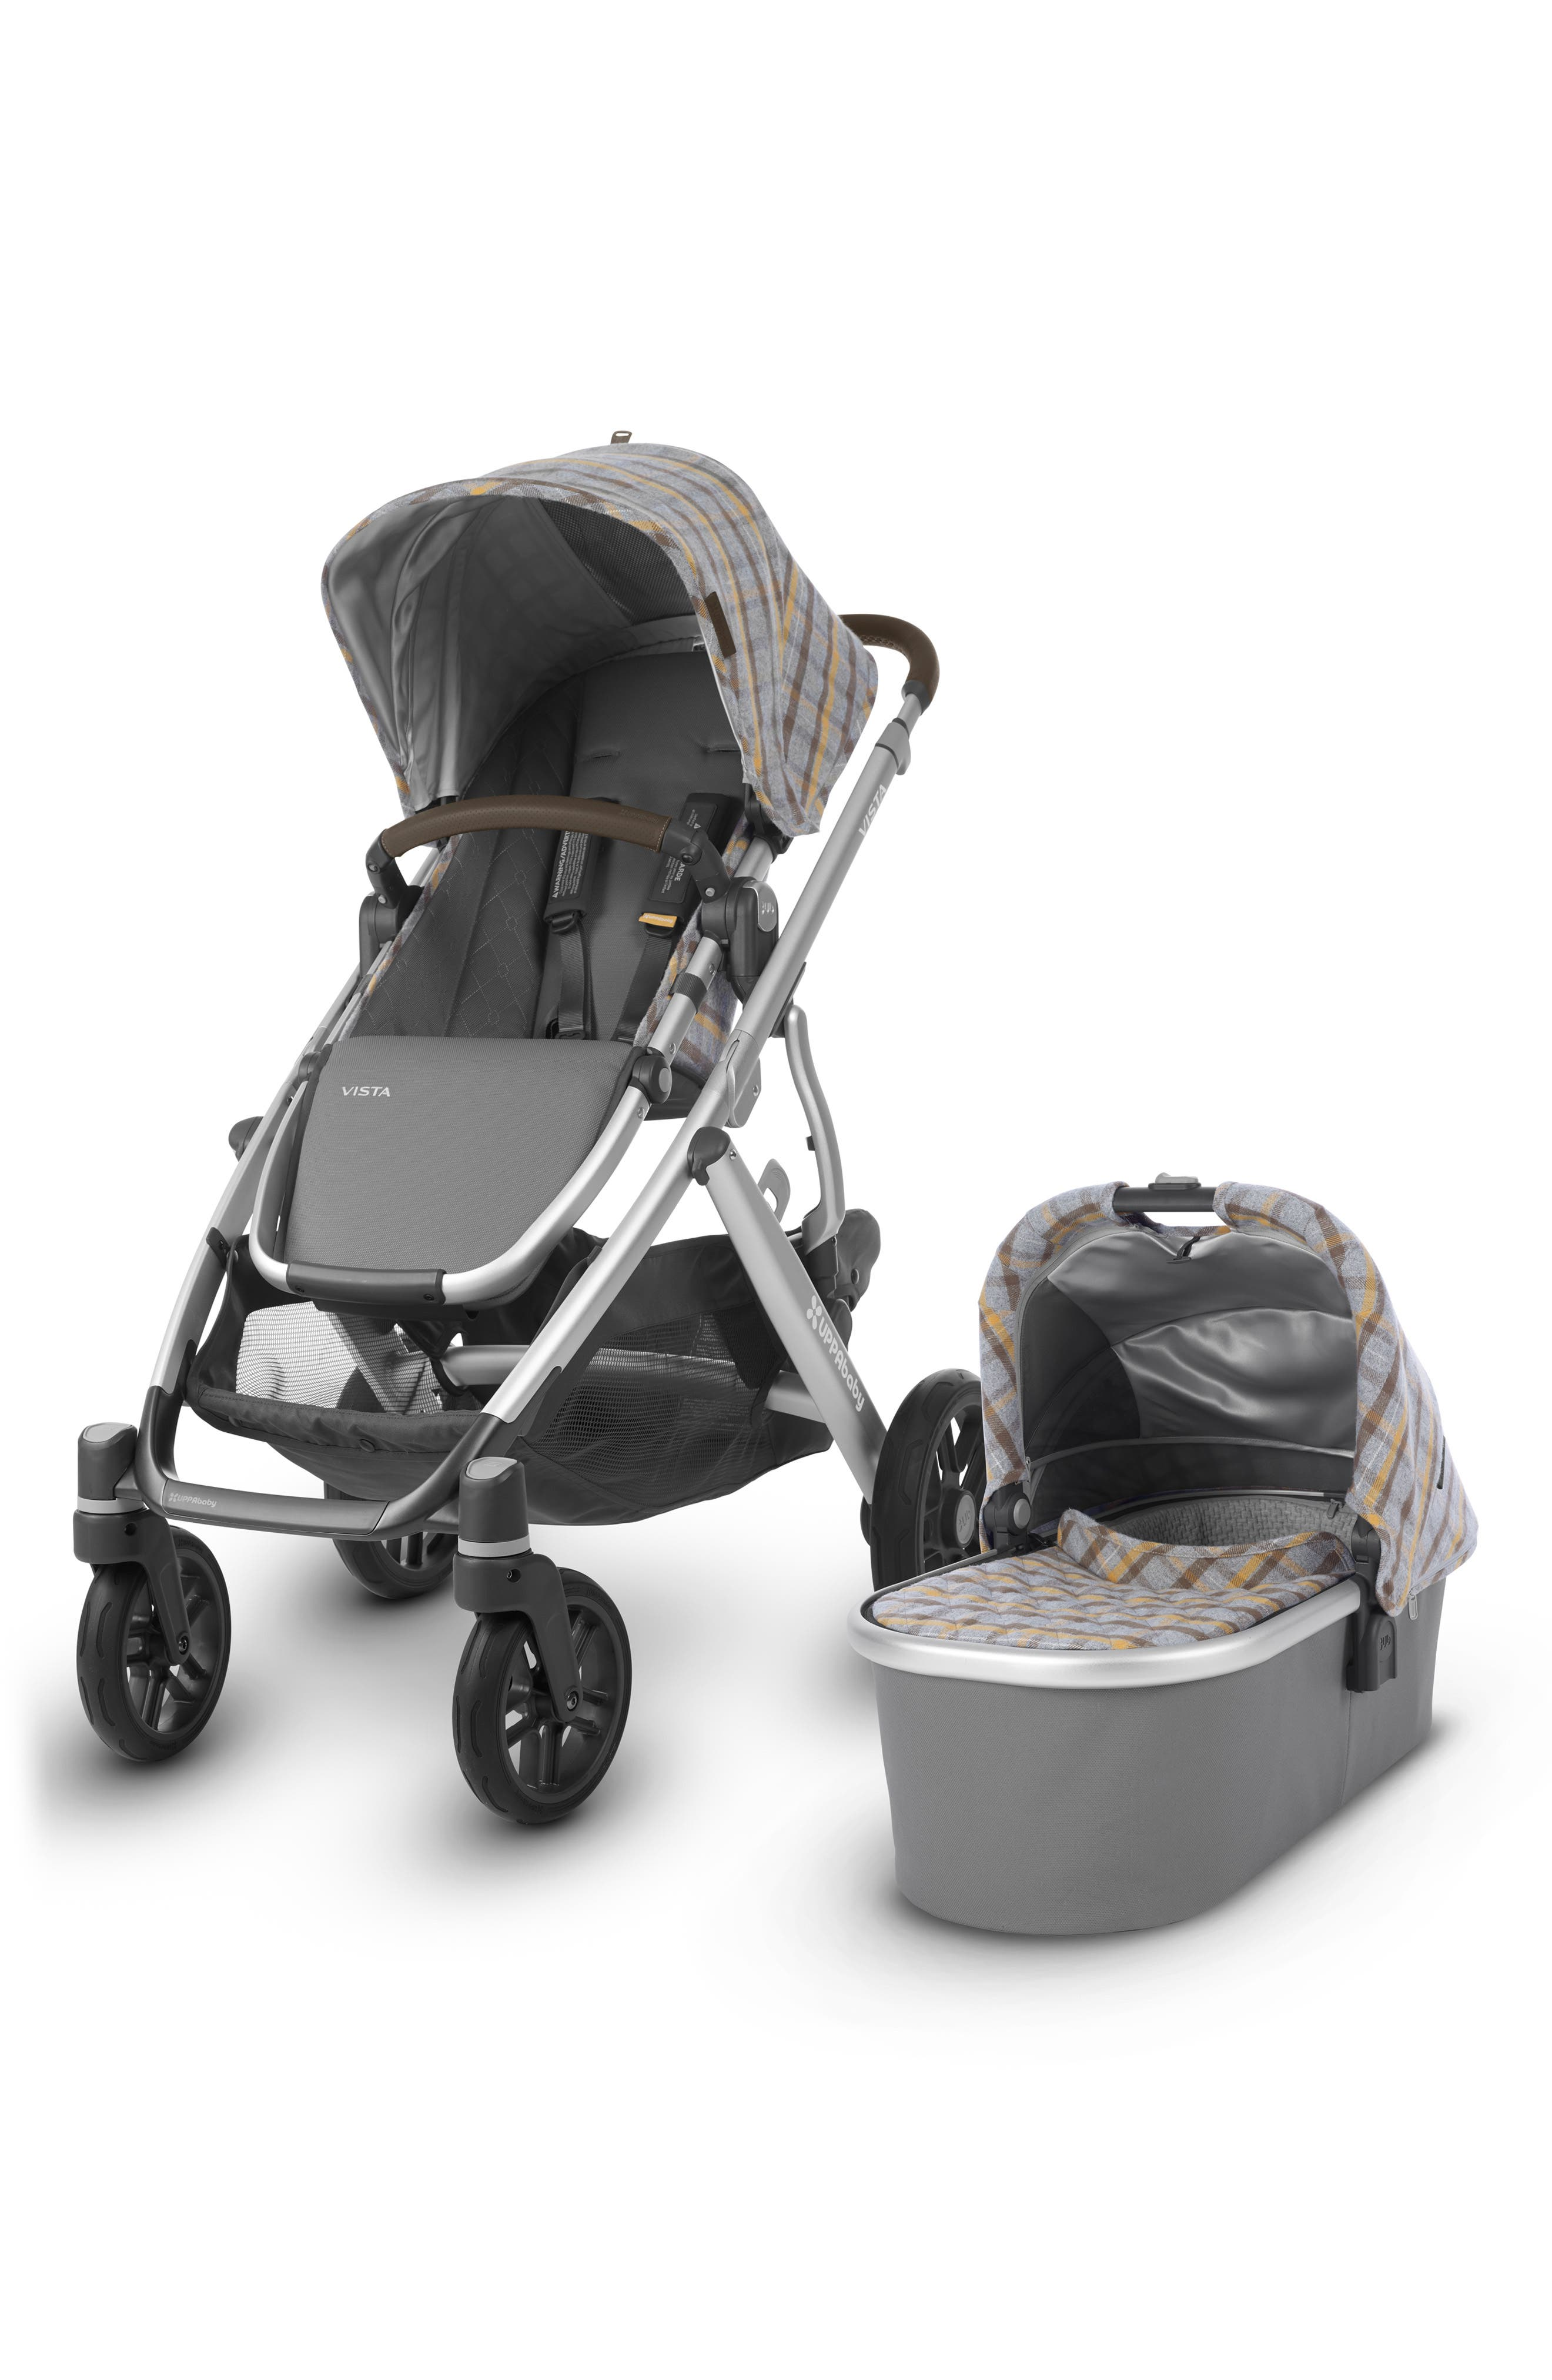 VISTA Spenser Convertible Stroller with Bassinet & Toddler Seat, Main, color, GREY/ YELLOW TARTAN